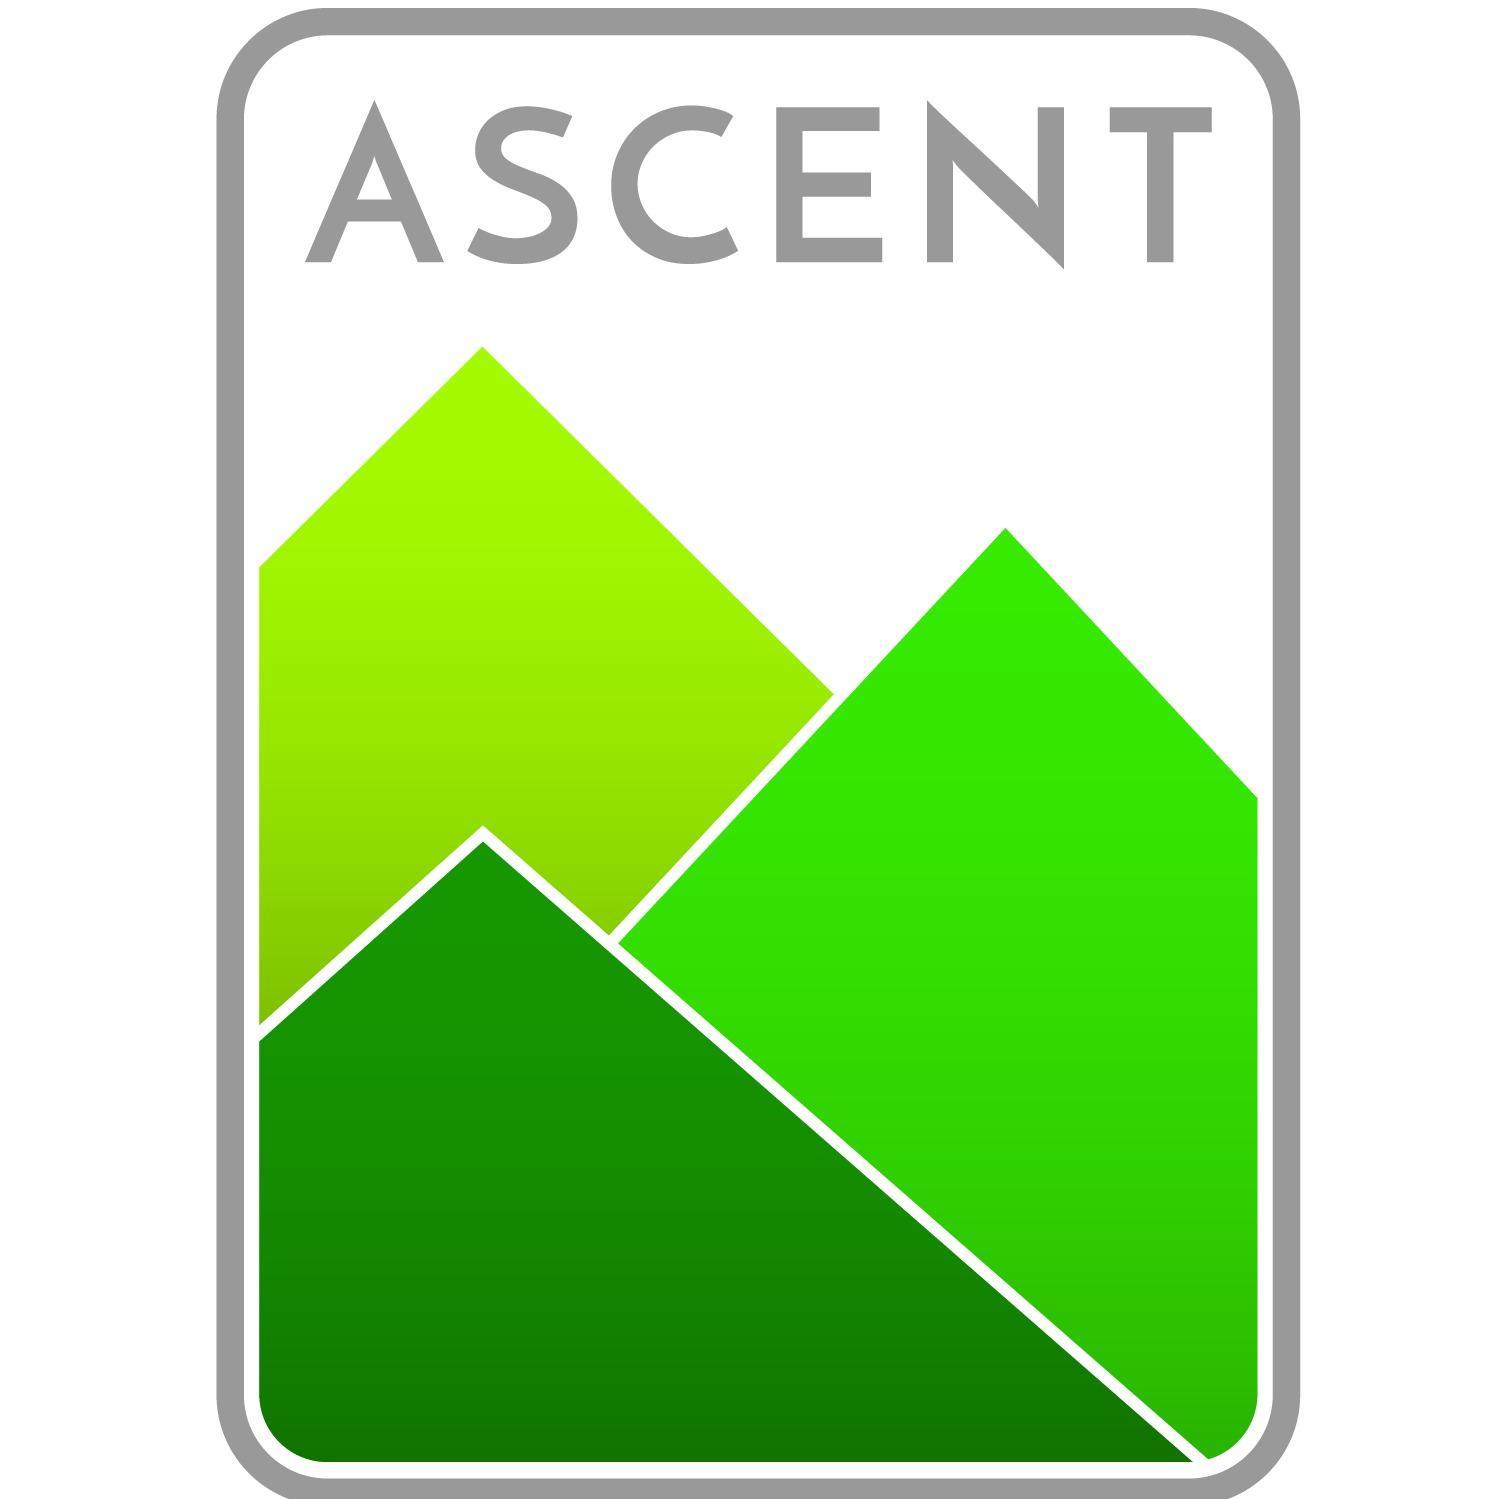 Ascent Fitness - Tacoma, WA 98405 - (253)272-2811 | ShowMeLocal.com